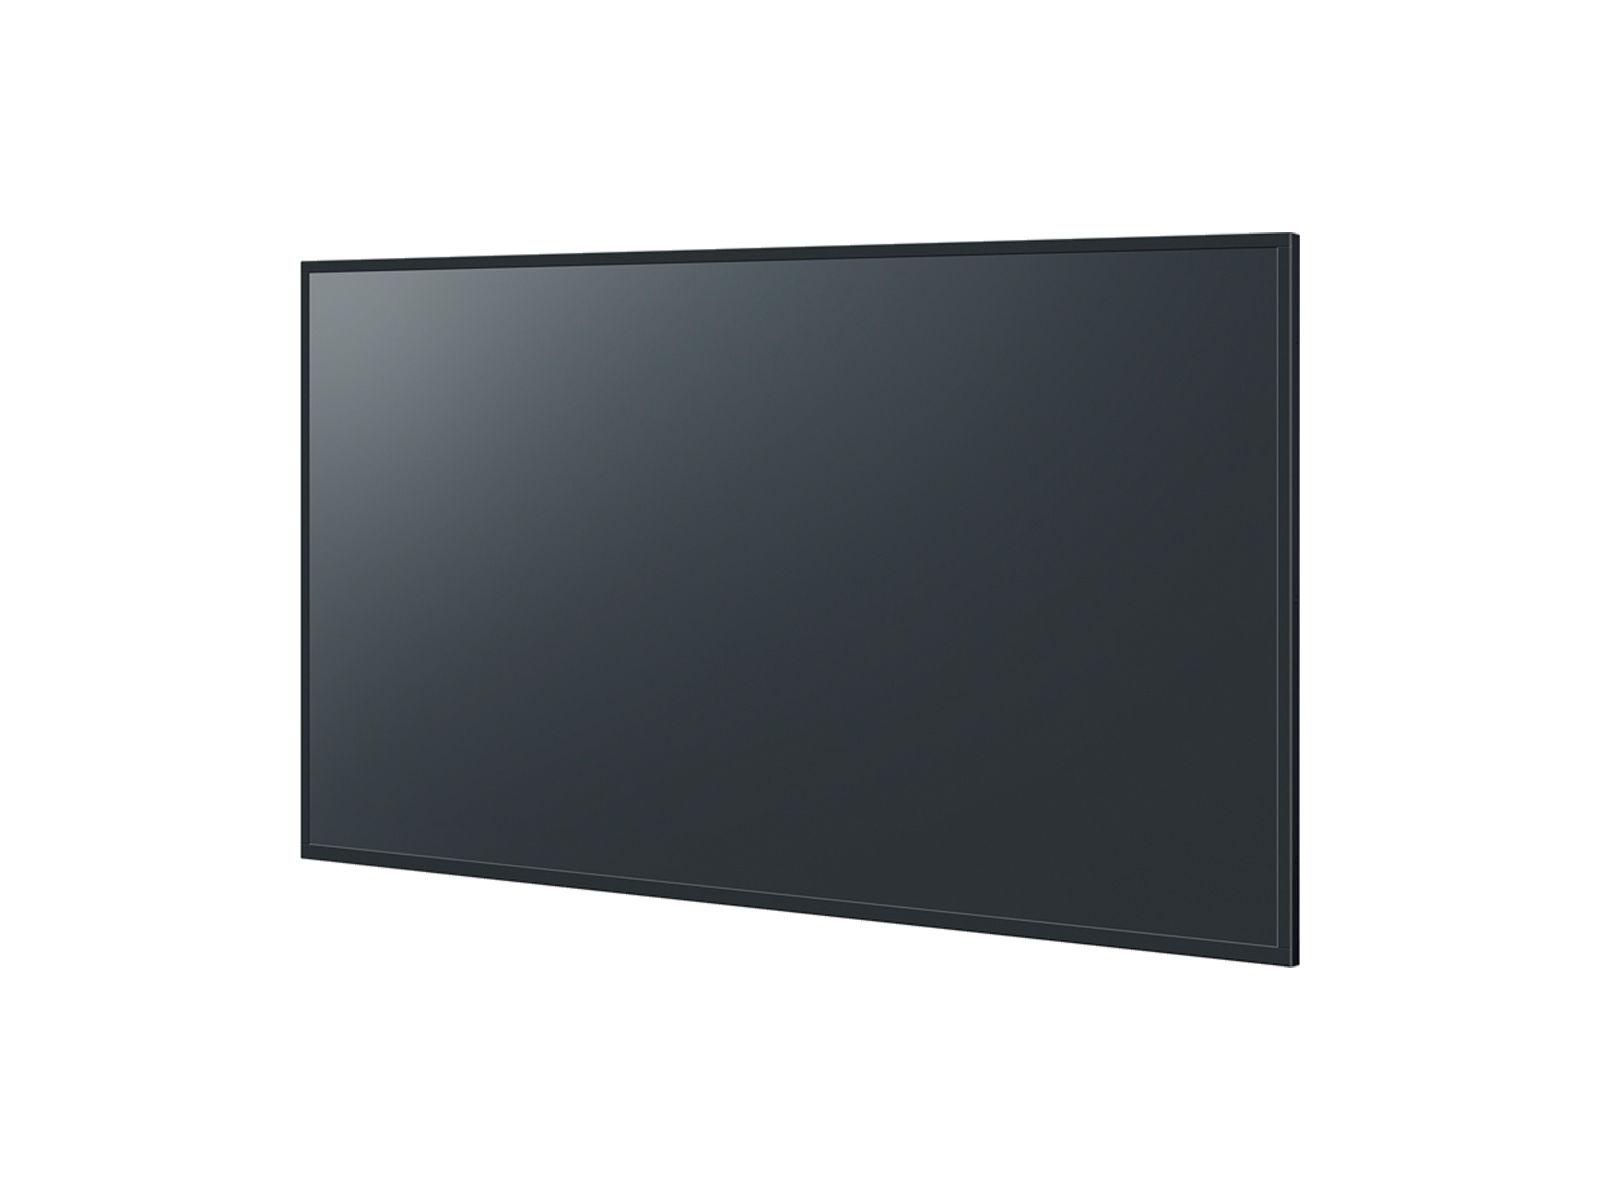 "Panasonic TH-86SQ1-IR | 217 cm 86"" UHD LCD-Display, LED, 500 cd/m²,, LAN, USB Mediaplayer, Lautsprecher, Infrarot-Touch"